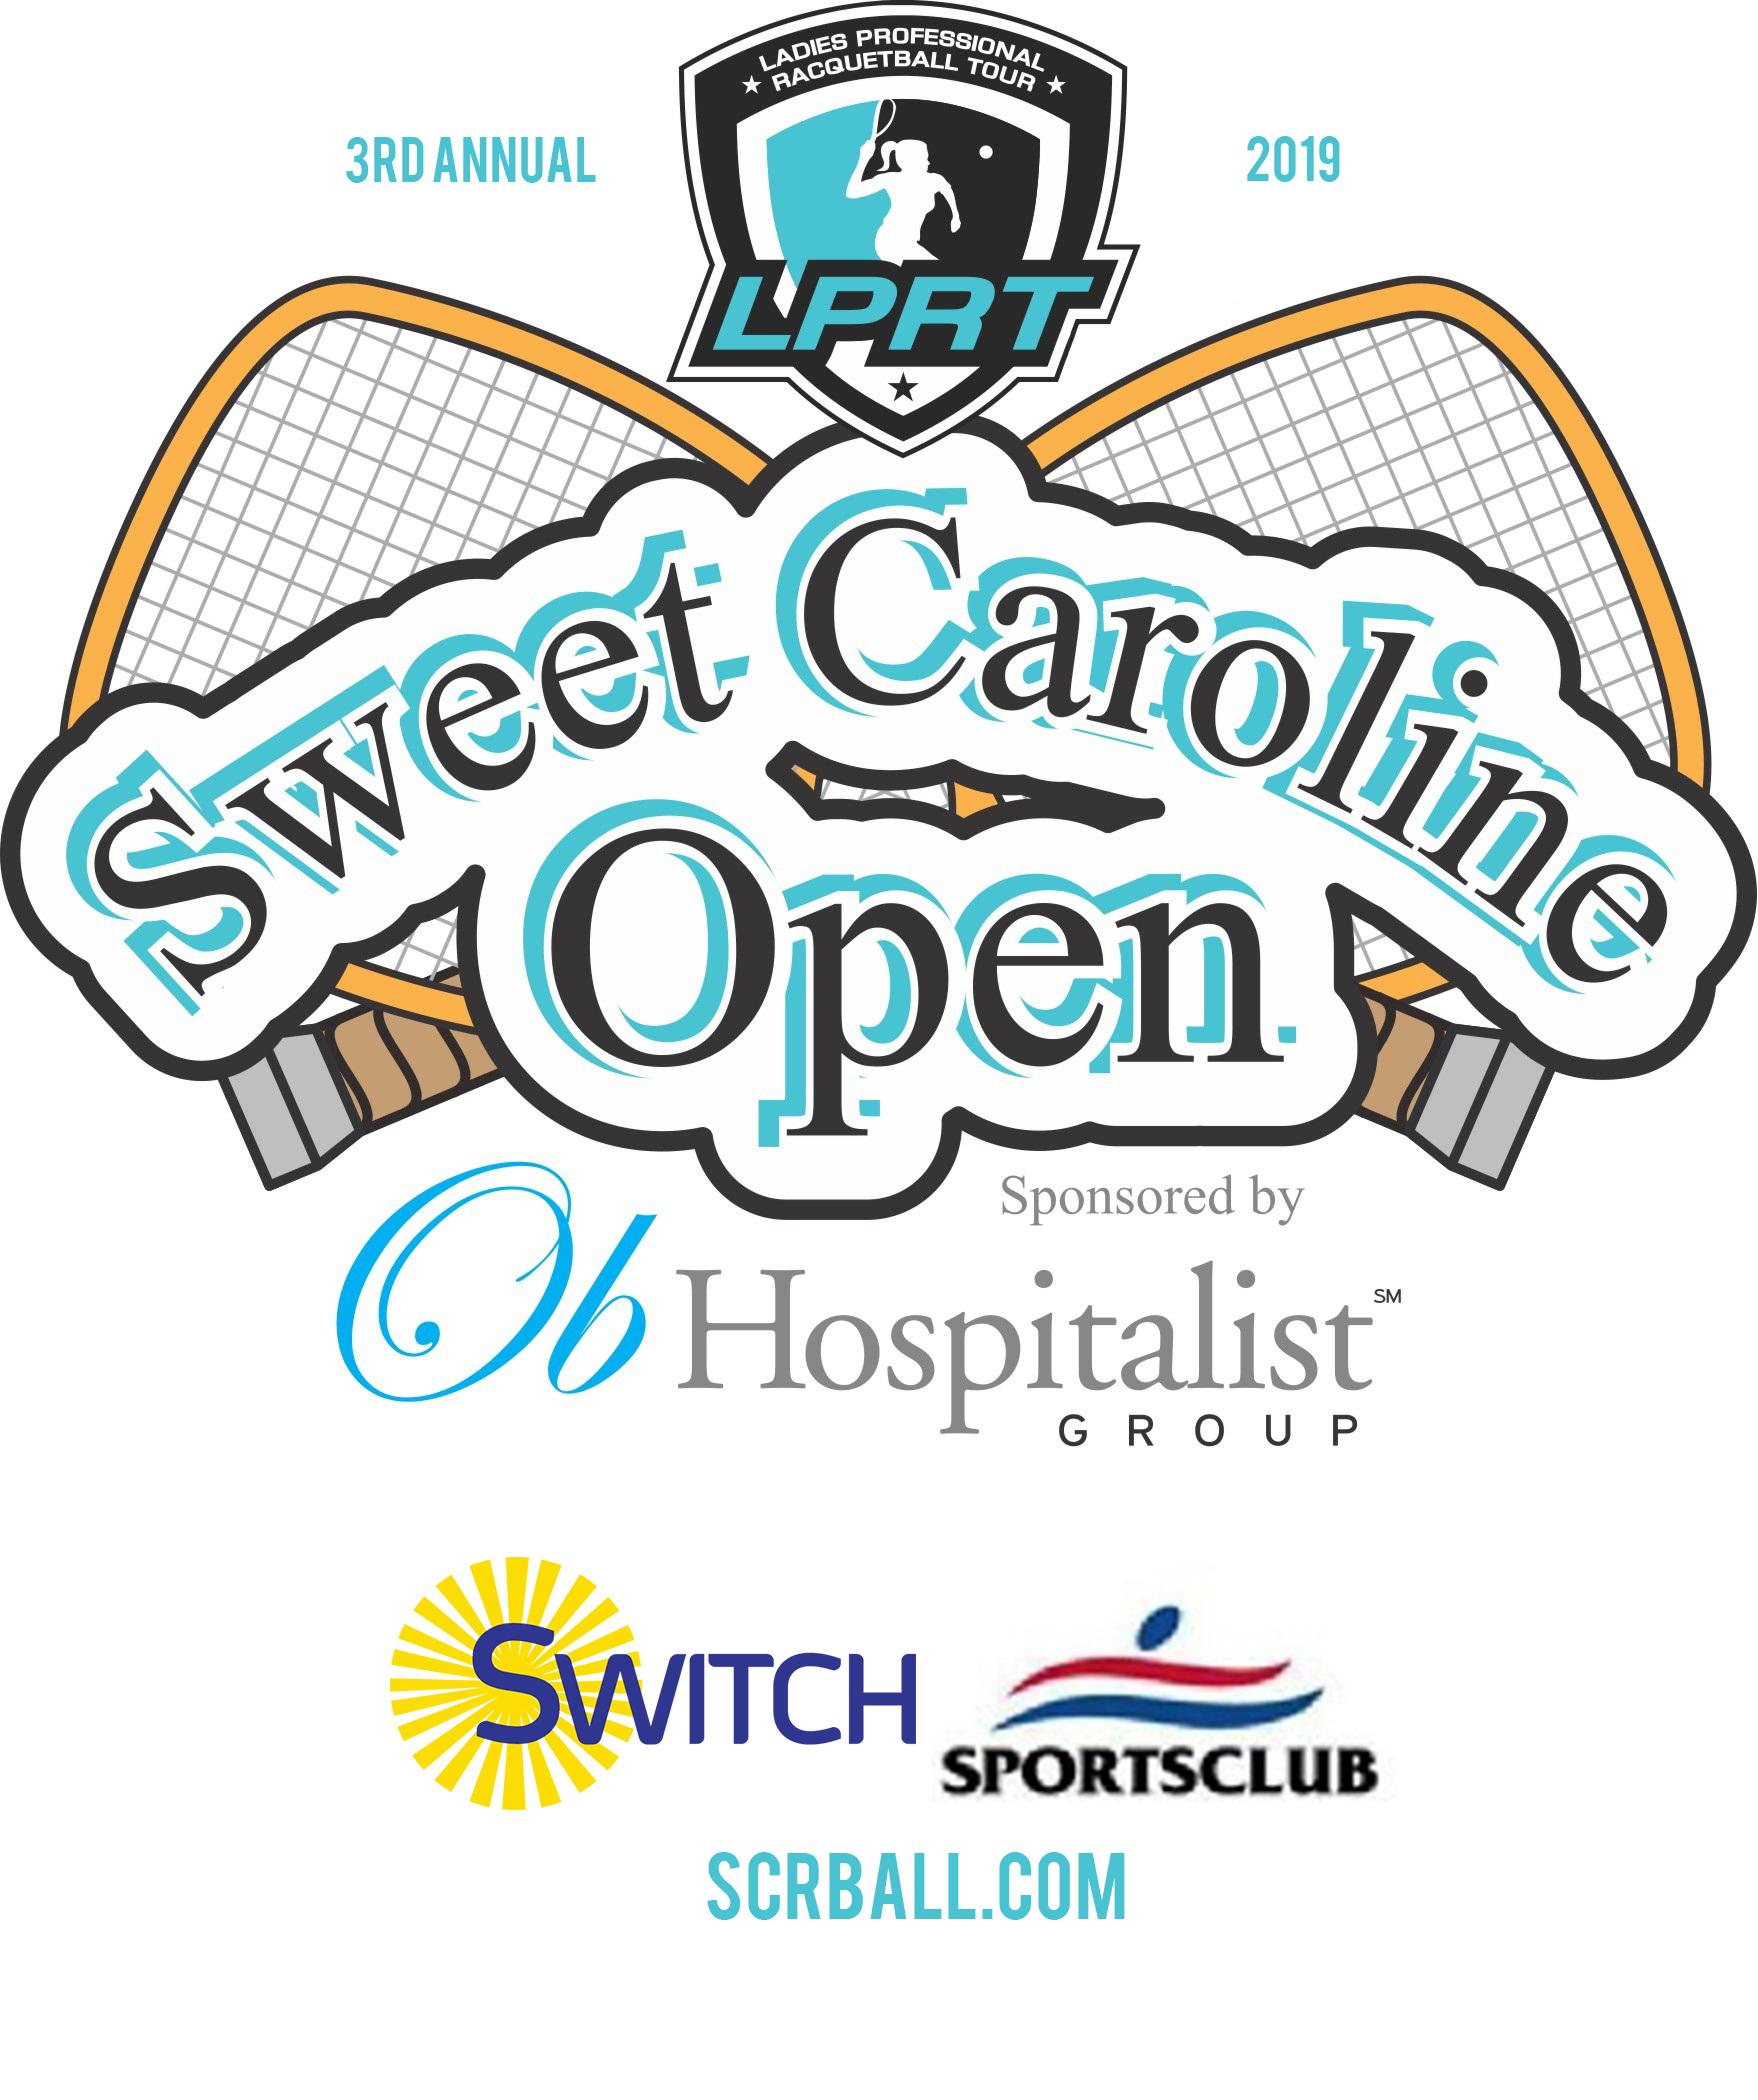 3rd Annual LPRT Sweet Caroline Open 2019